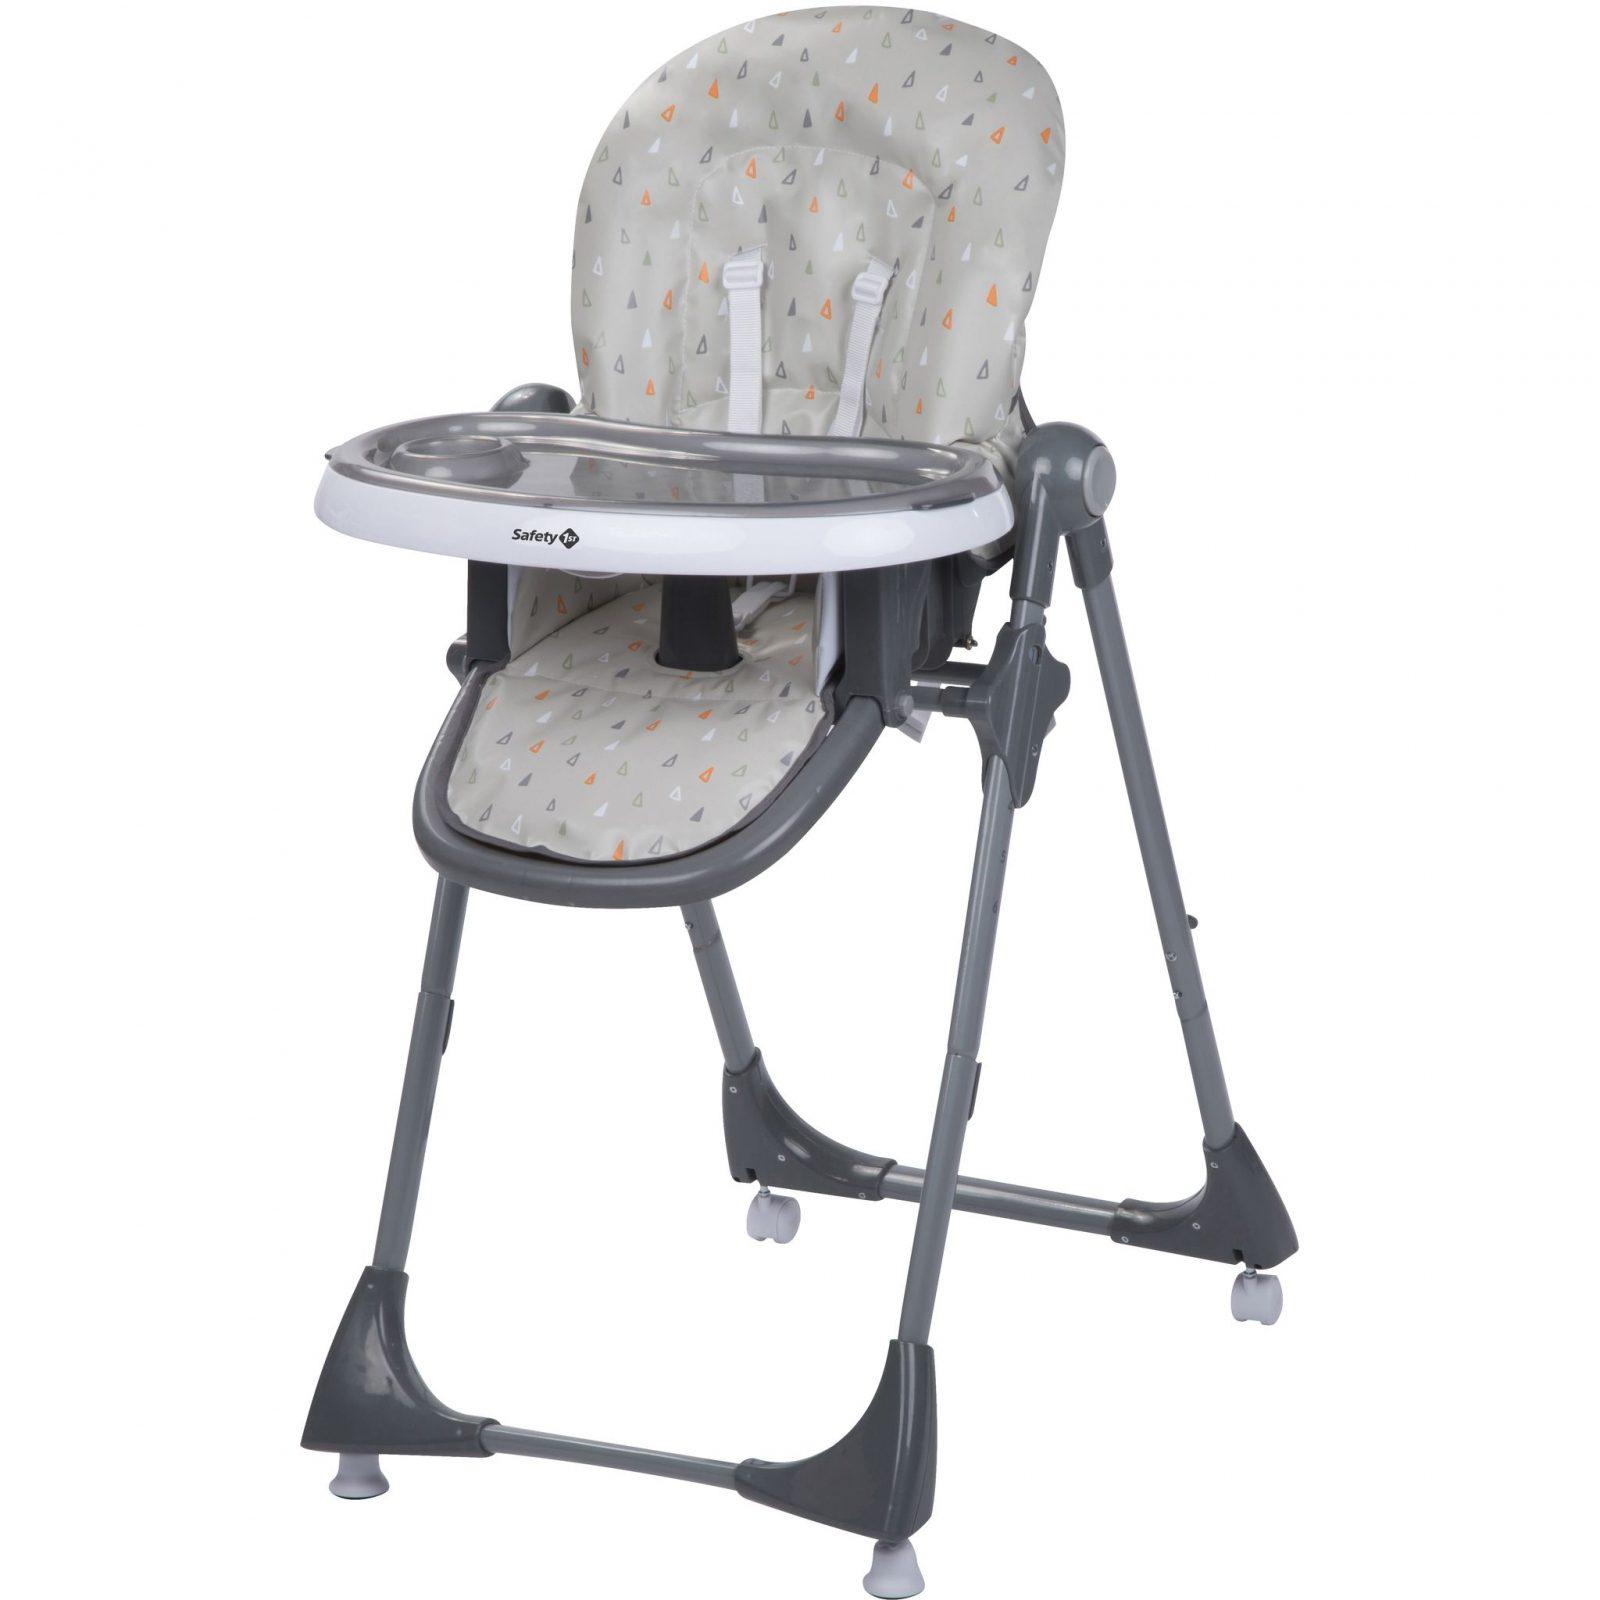 Kinderstoel Vanaf 3 Maanden.Safety 1st Kiwi Kinderstoel